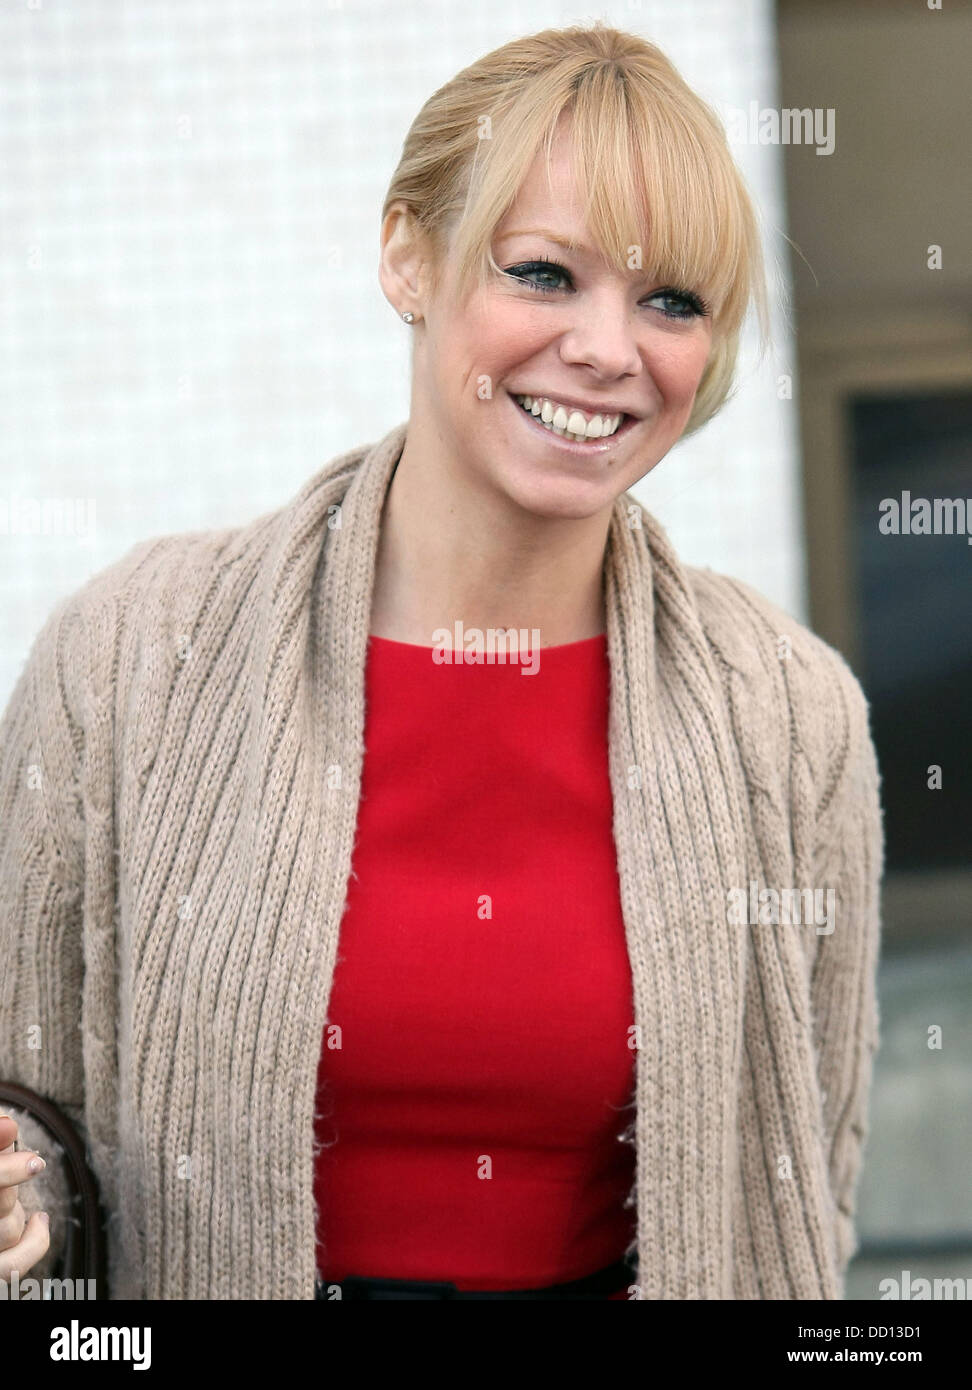 Liz McClarnon at the ITV studios London, England - 16.01.12 - Stock Image